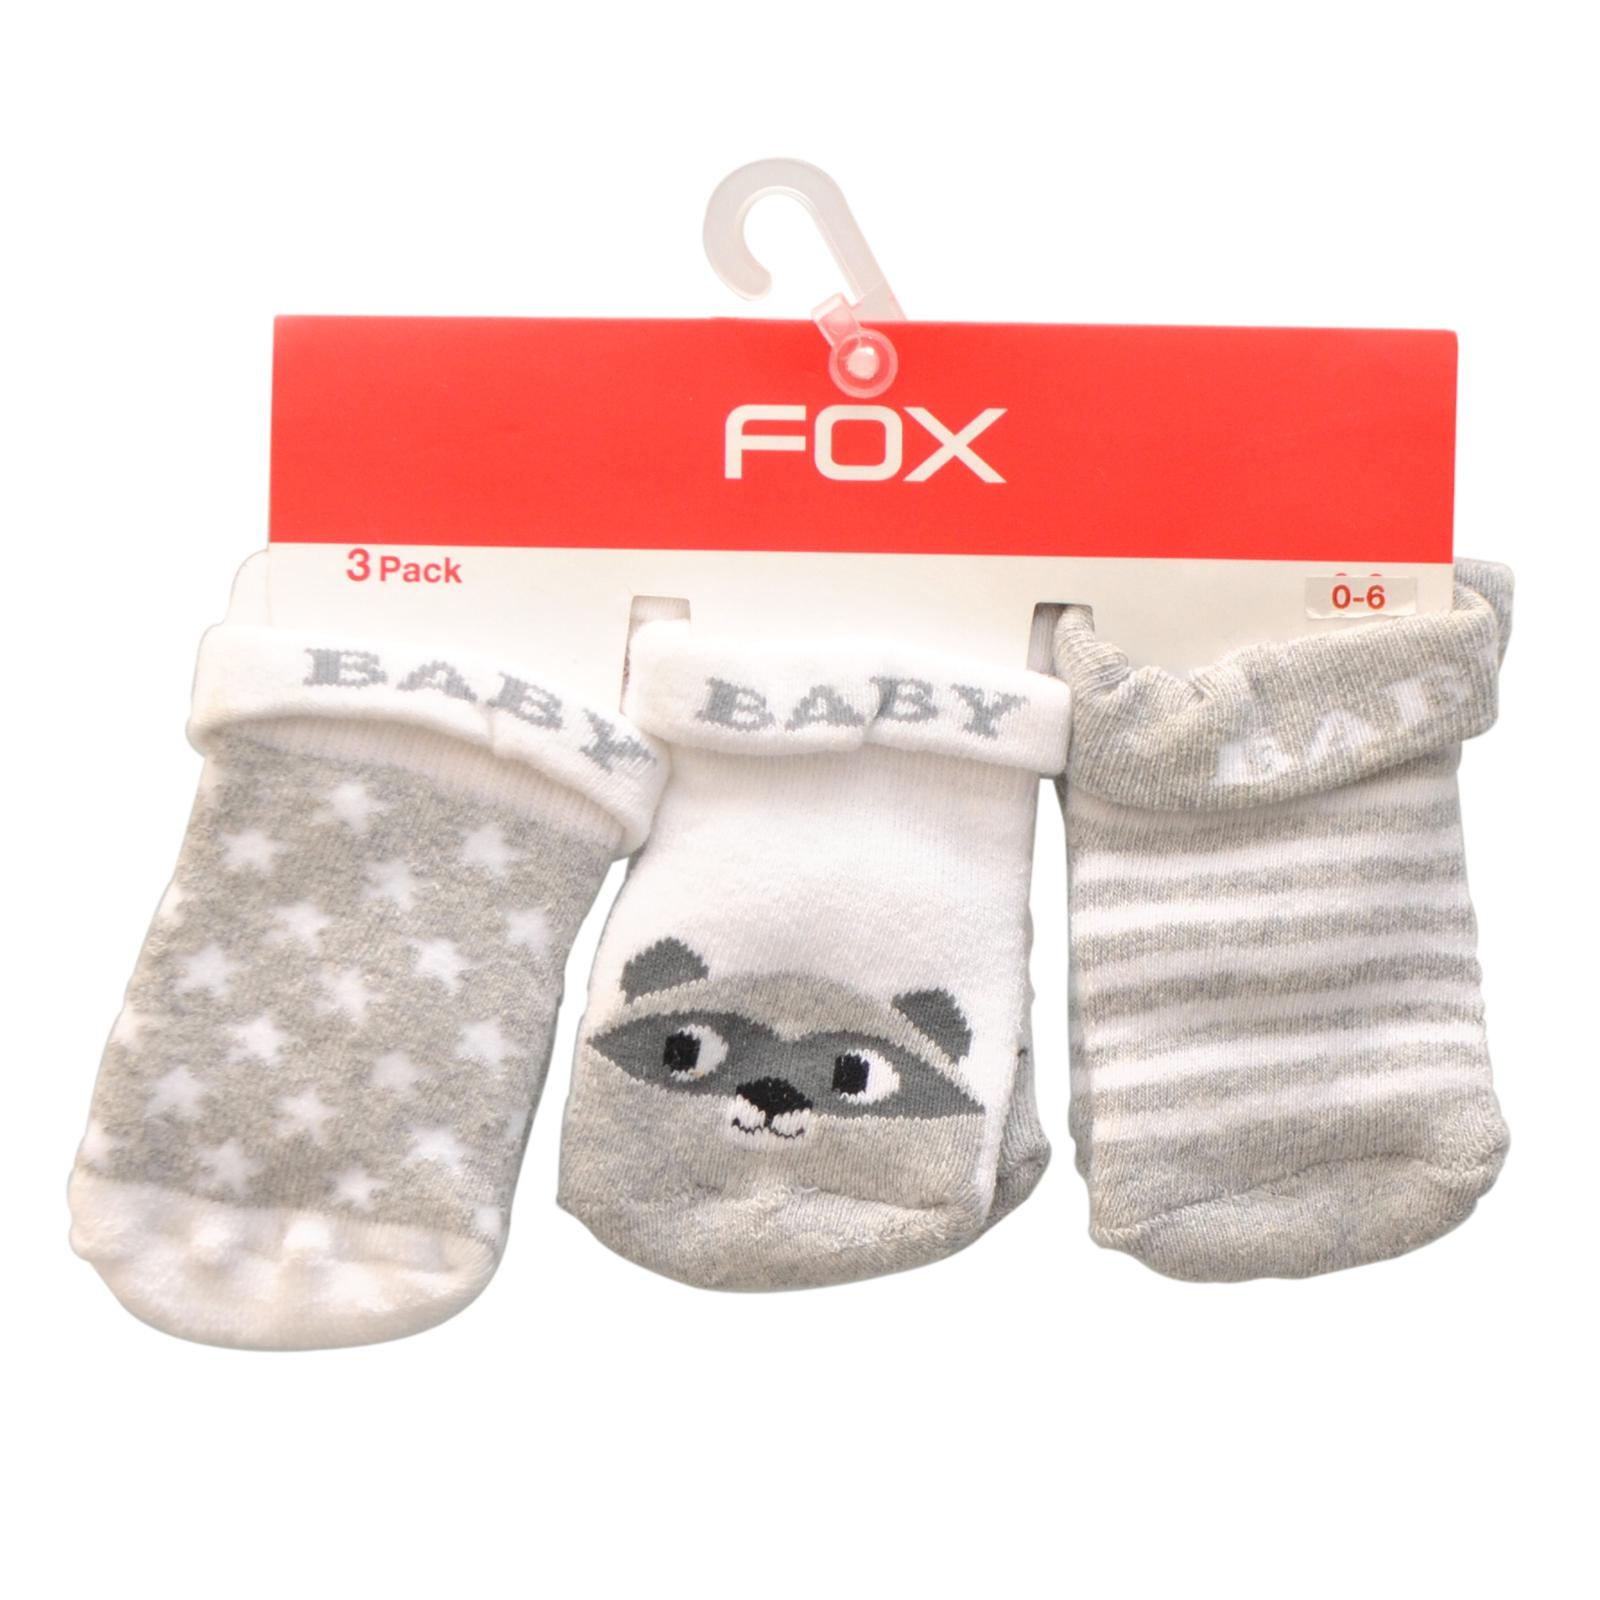 ����� FOX ���� ���� ����� ������ � 0 �� 6 ���.